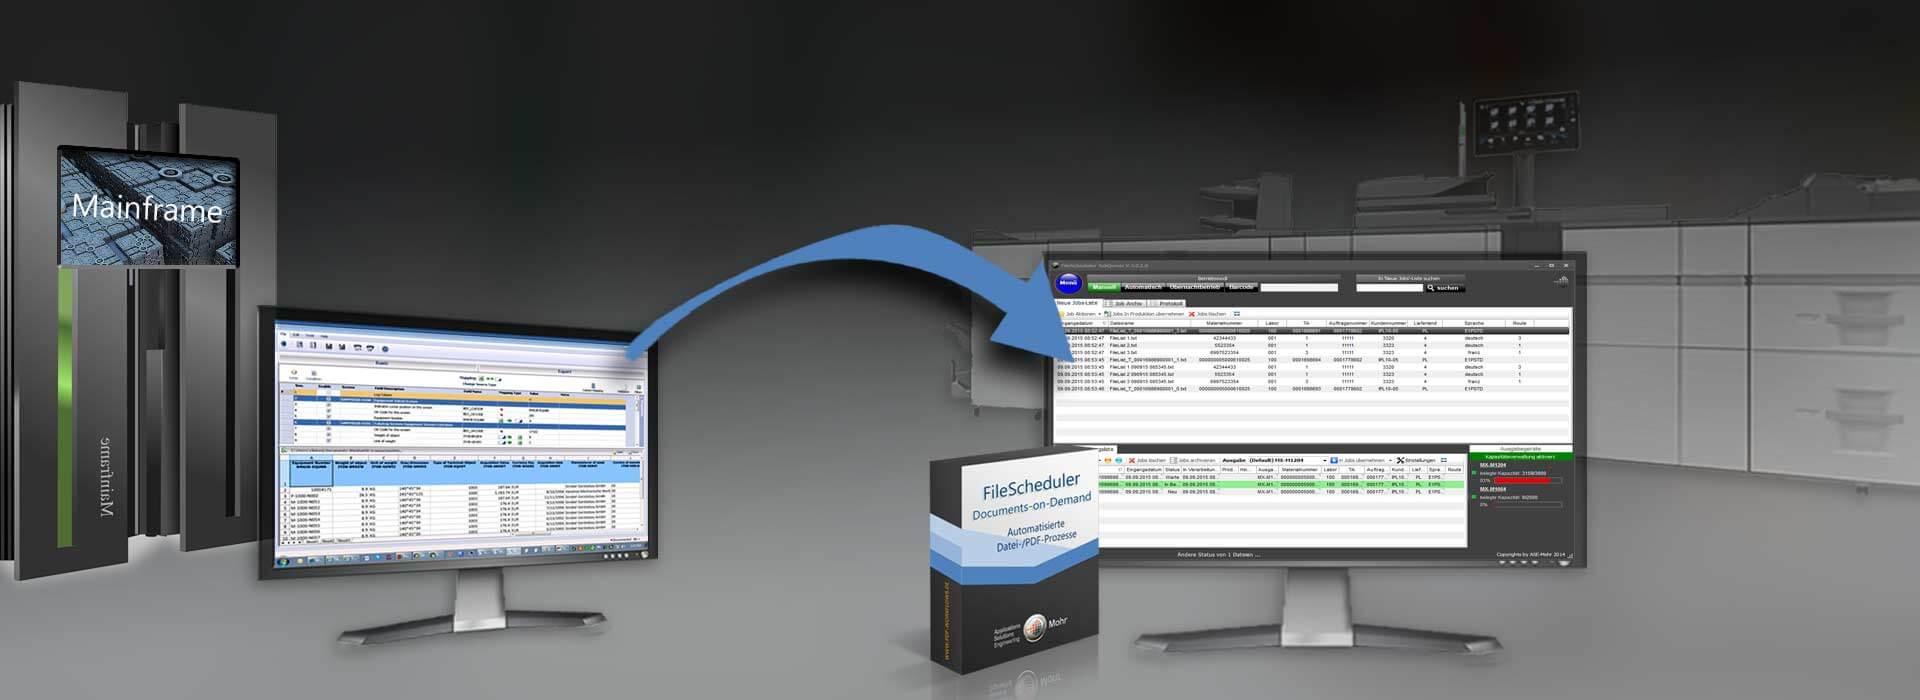 Abbildung Auftragsübergabe der Businessanwendung an FileScheduler DoD